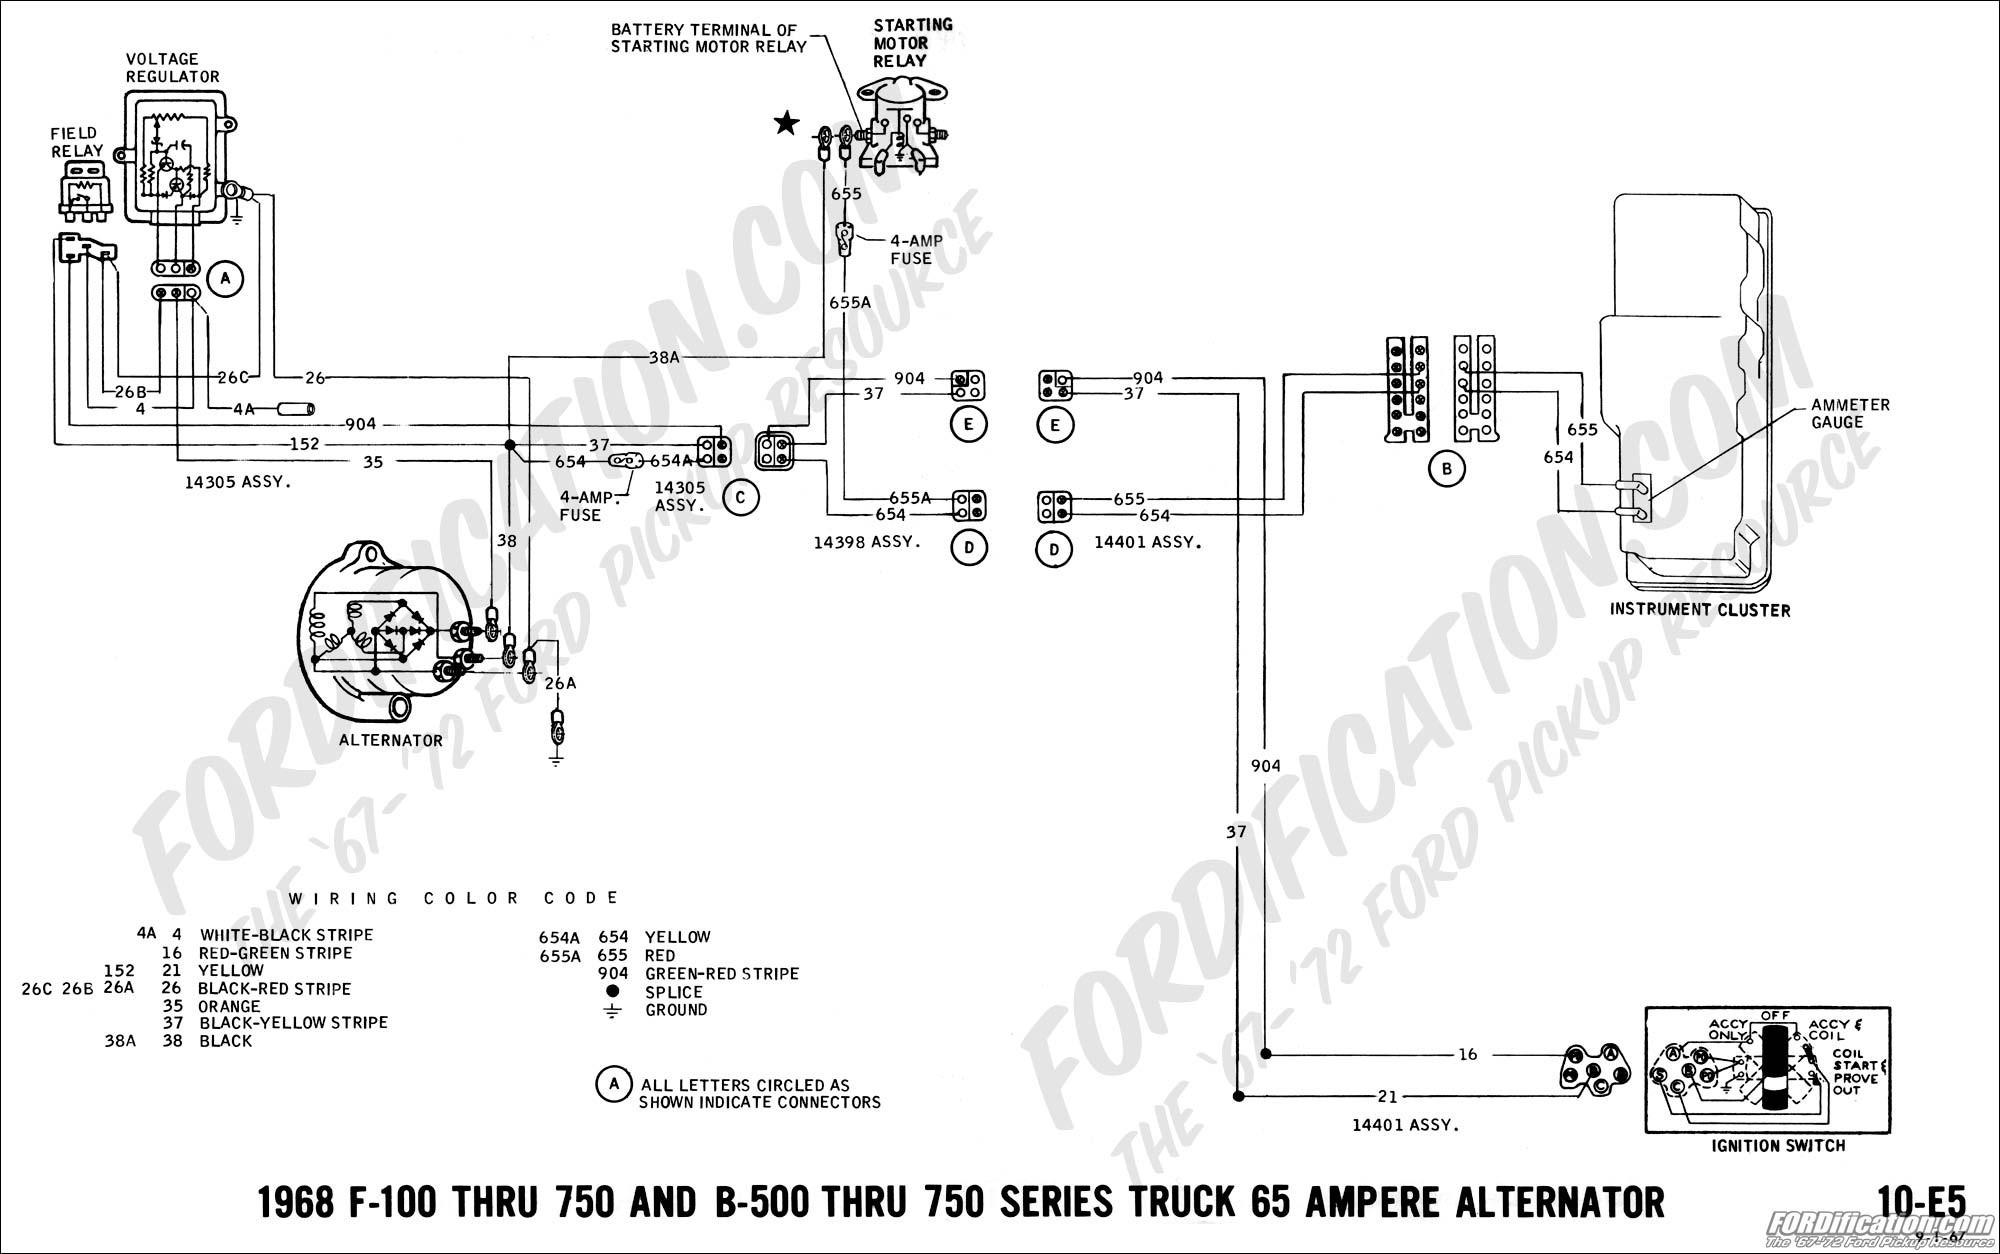 Turn Signal Wiring Diagram Chevy Truck Inspirational Turn Signal Wiring Diagram Diagram Of Turn Signal Wiring Diagram Chevy Truck